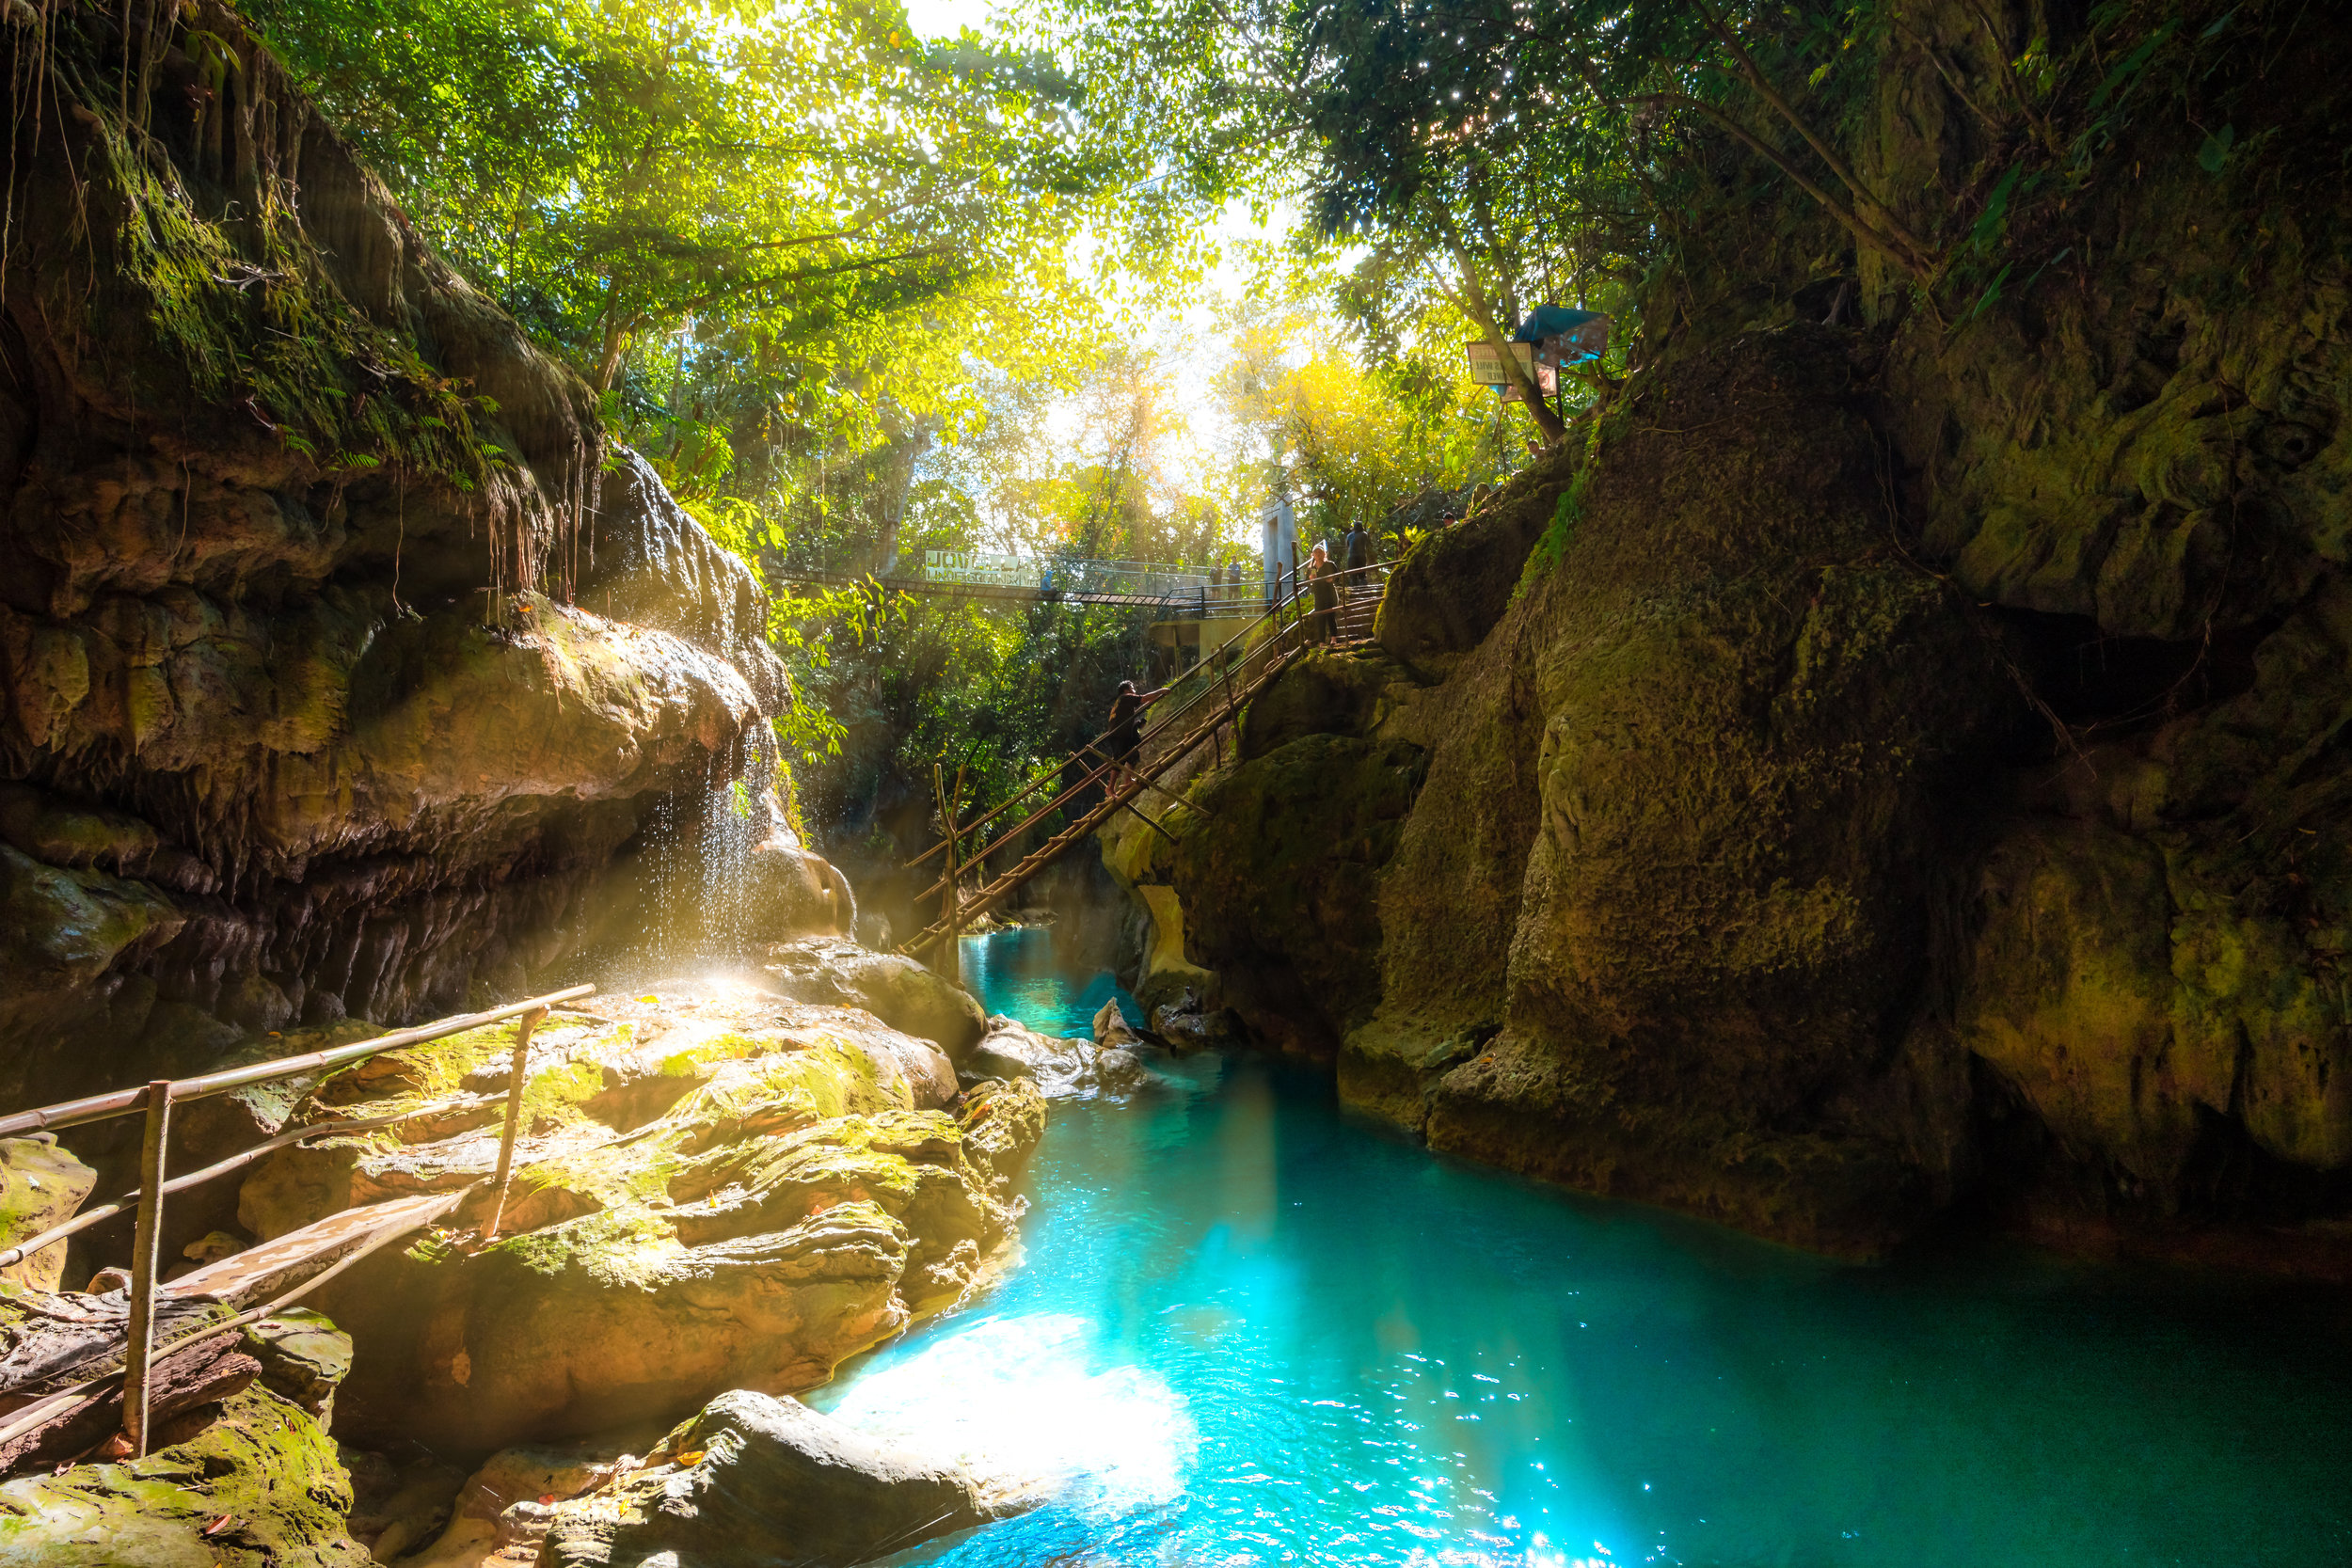 jovellar-underground-river-edits-3.jpg